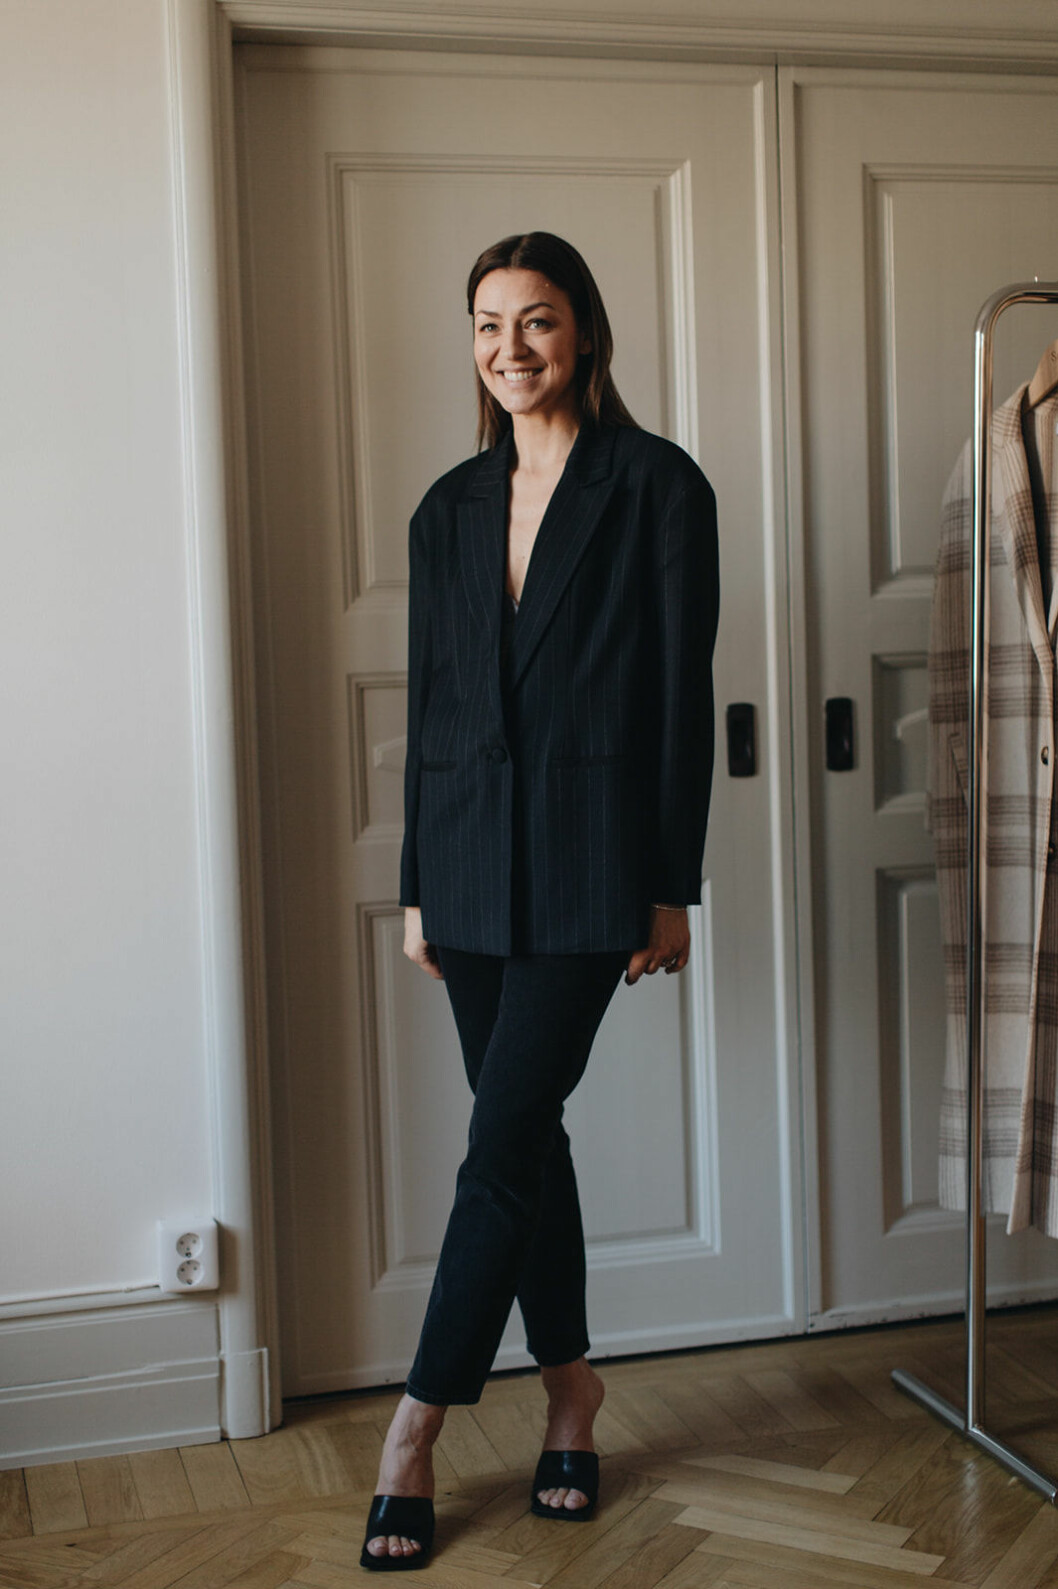 Svenskt mode Styleins grundare Elin Alemdar.